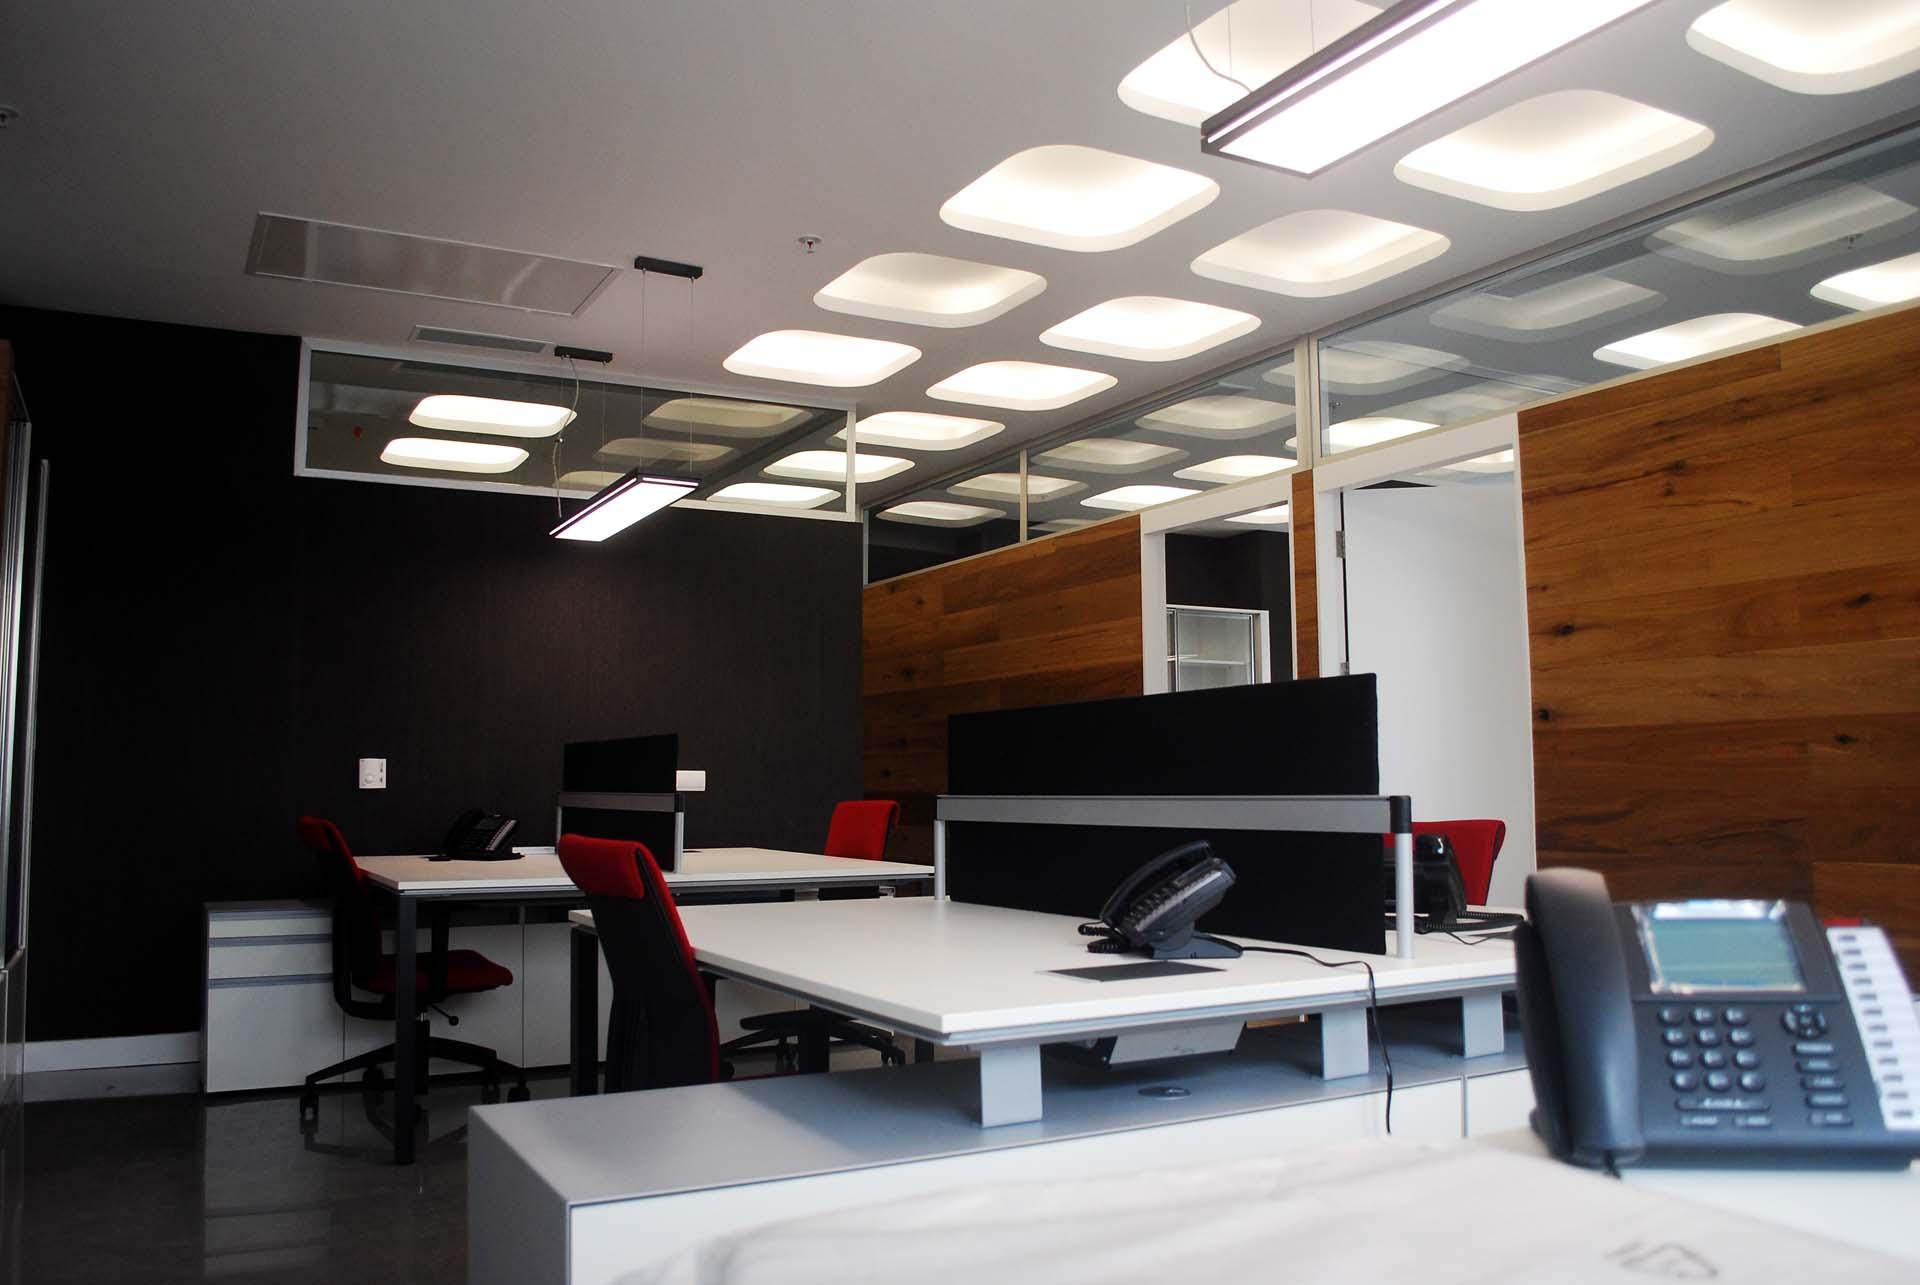 law firm interior design photos gallery